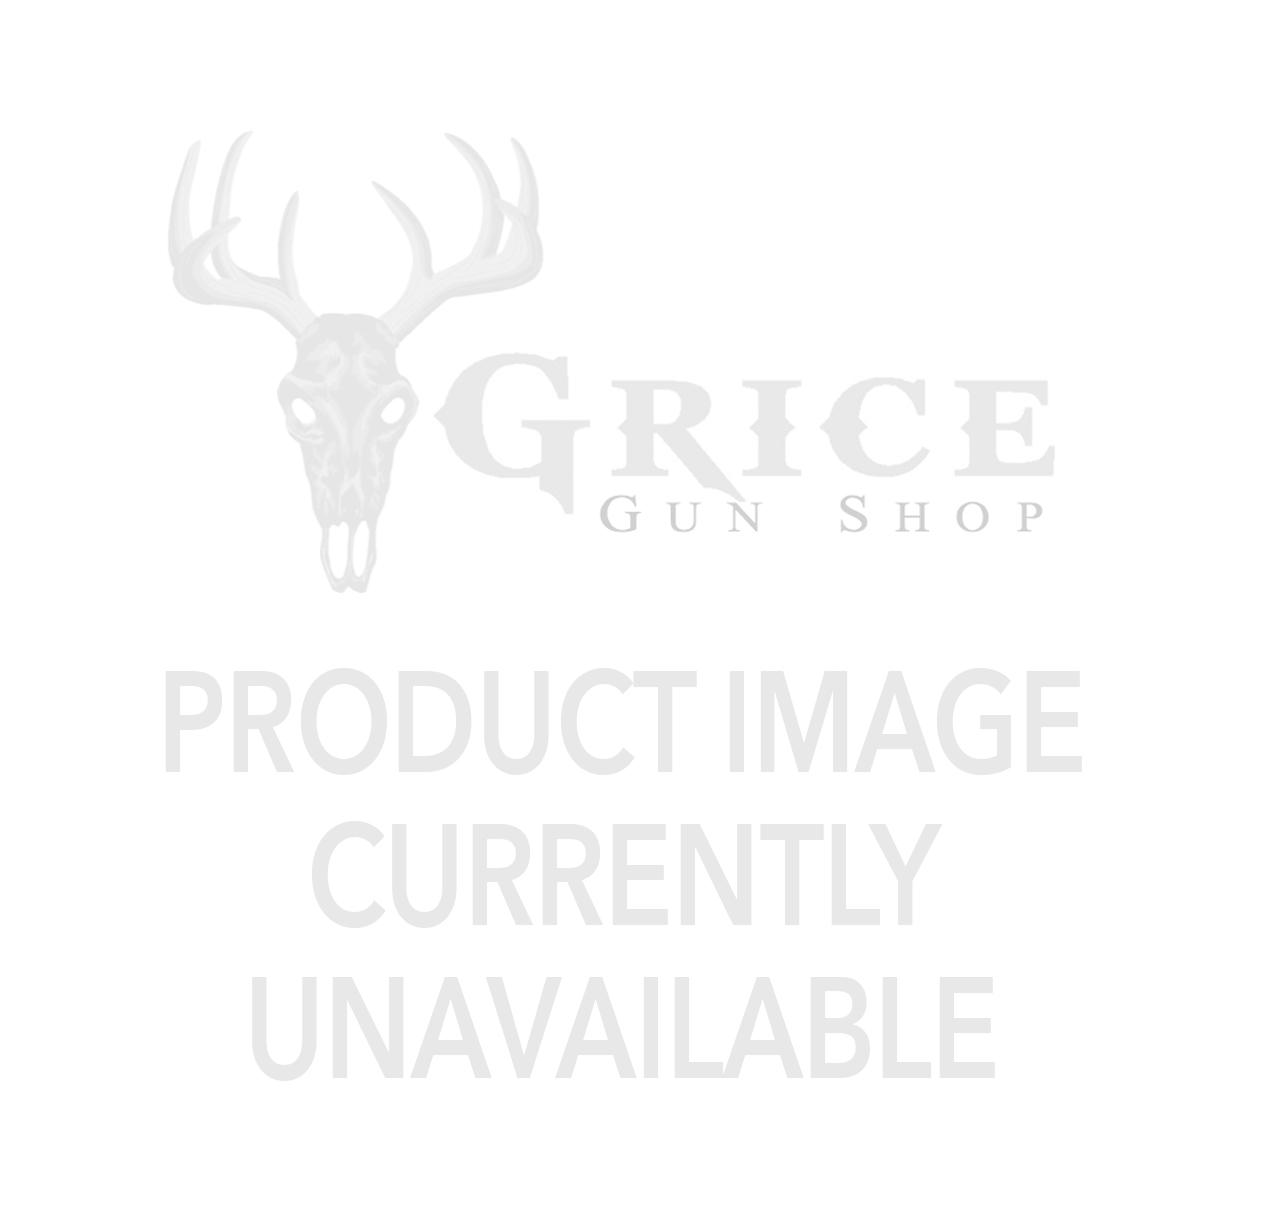 "Thompson Center - Pro Hunter 15"" Stainless Fluted Barrel 308Win"